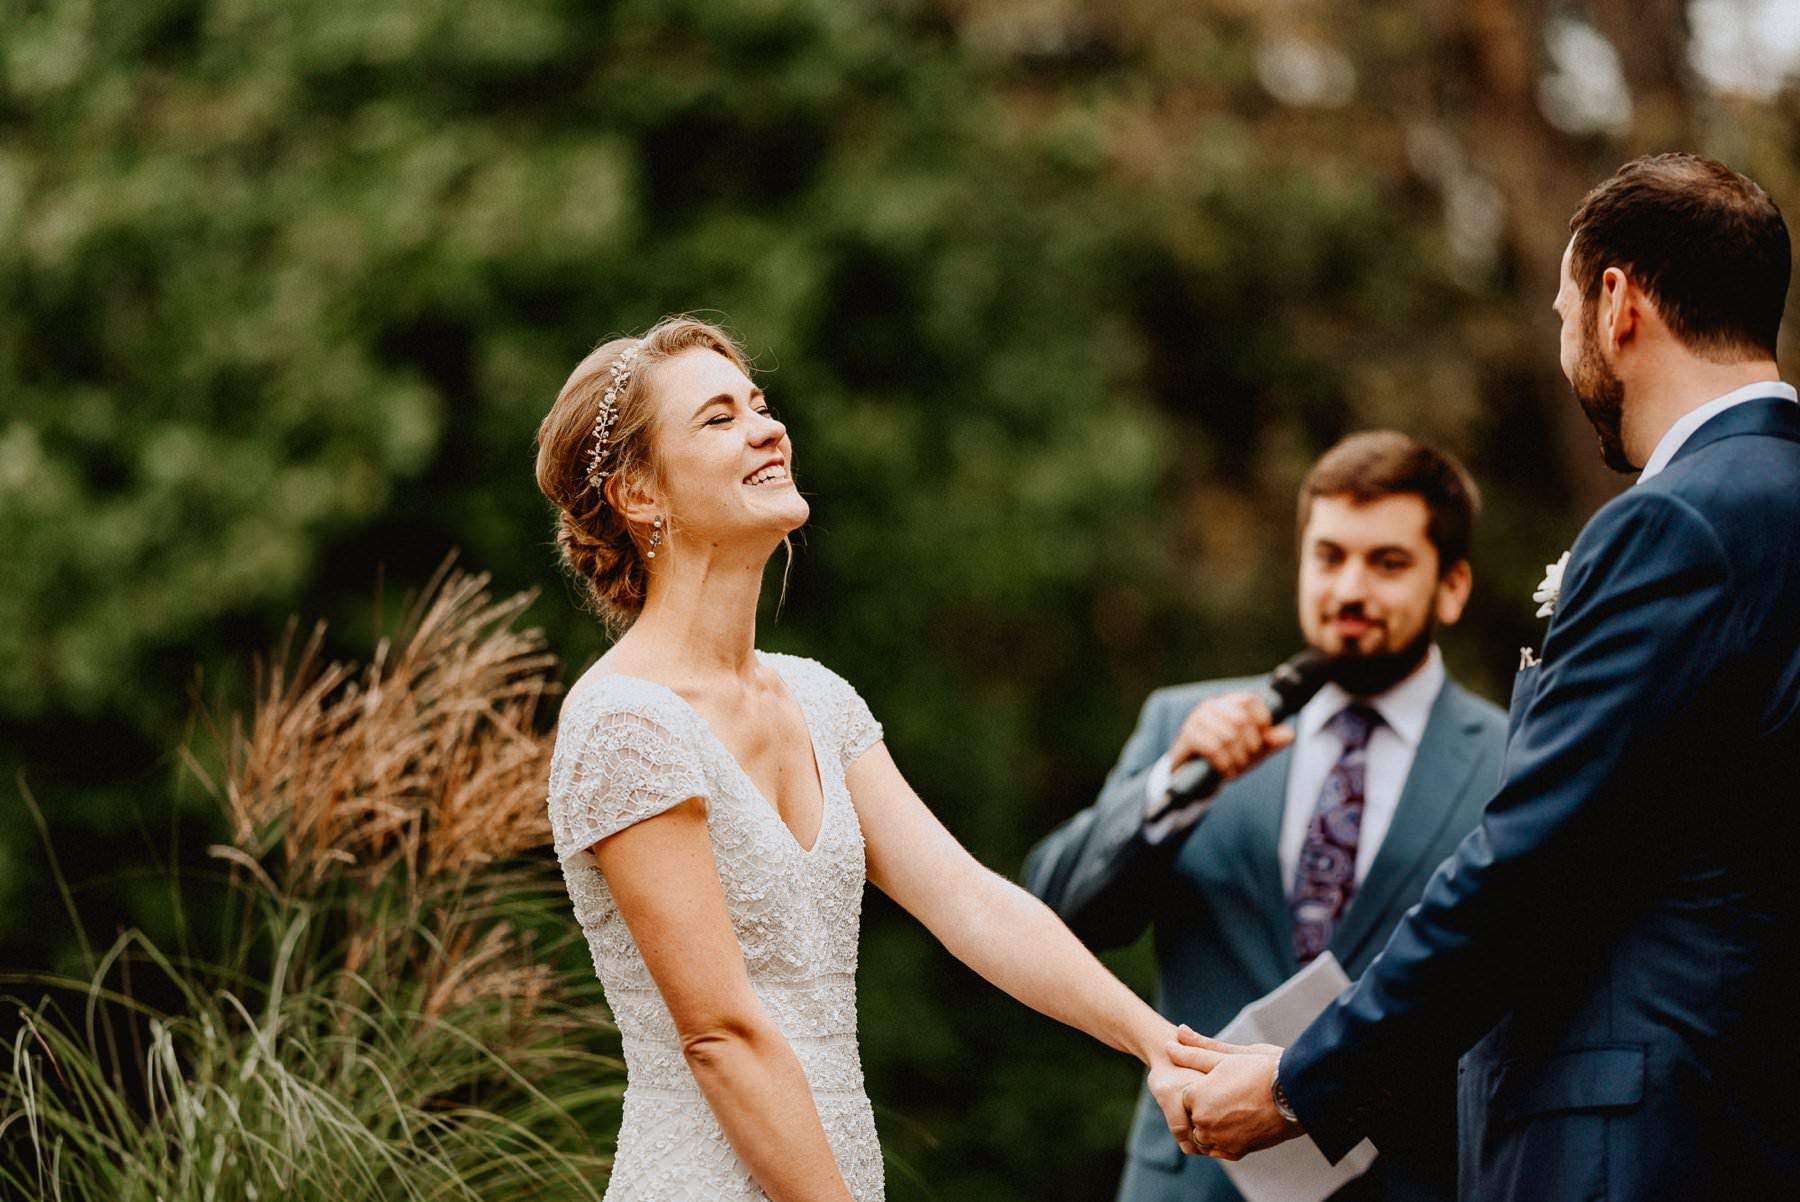 John_James_Audubon_Center_wedding-52.jpg